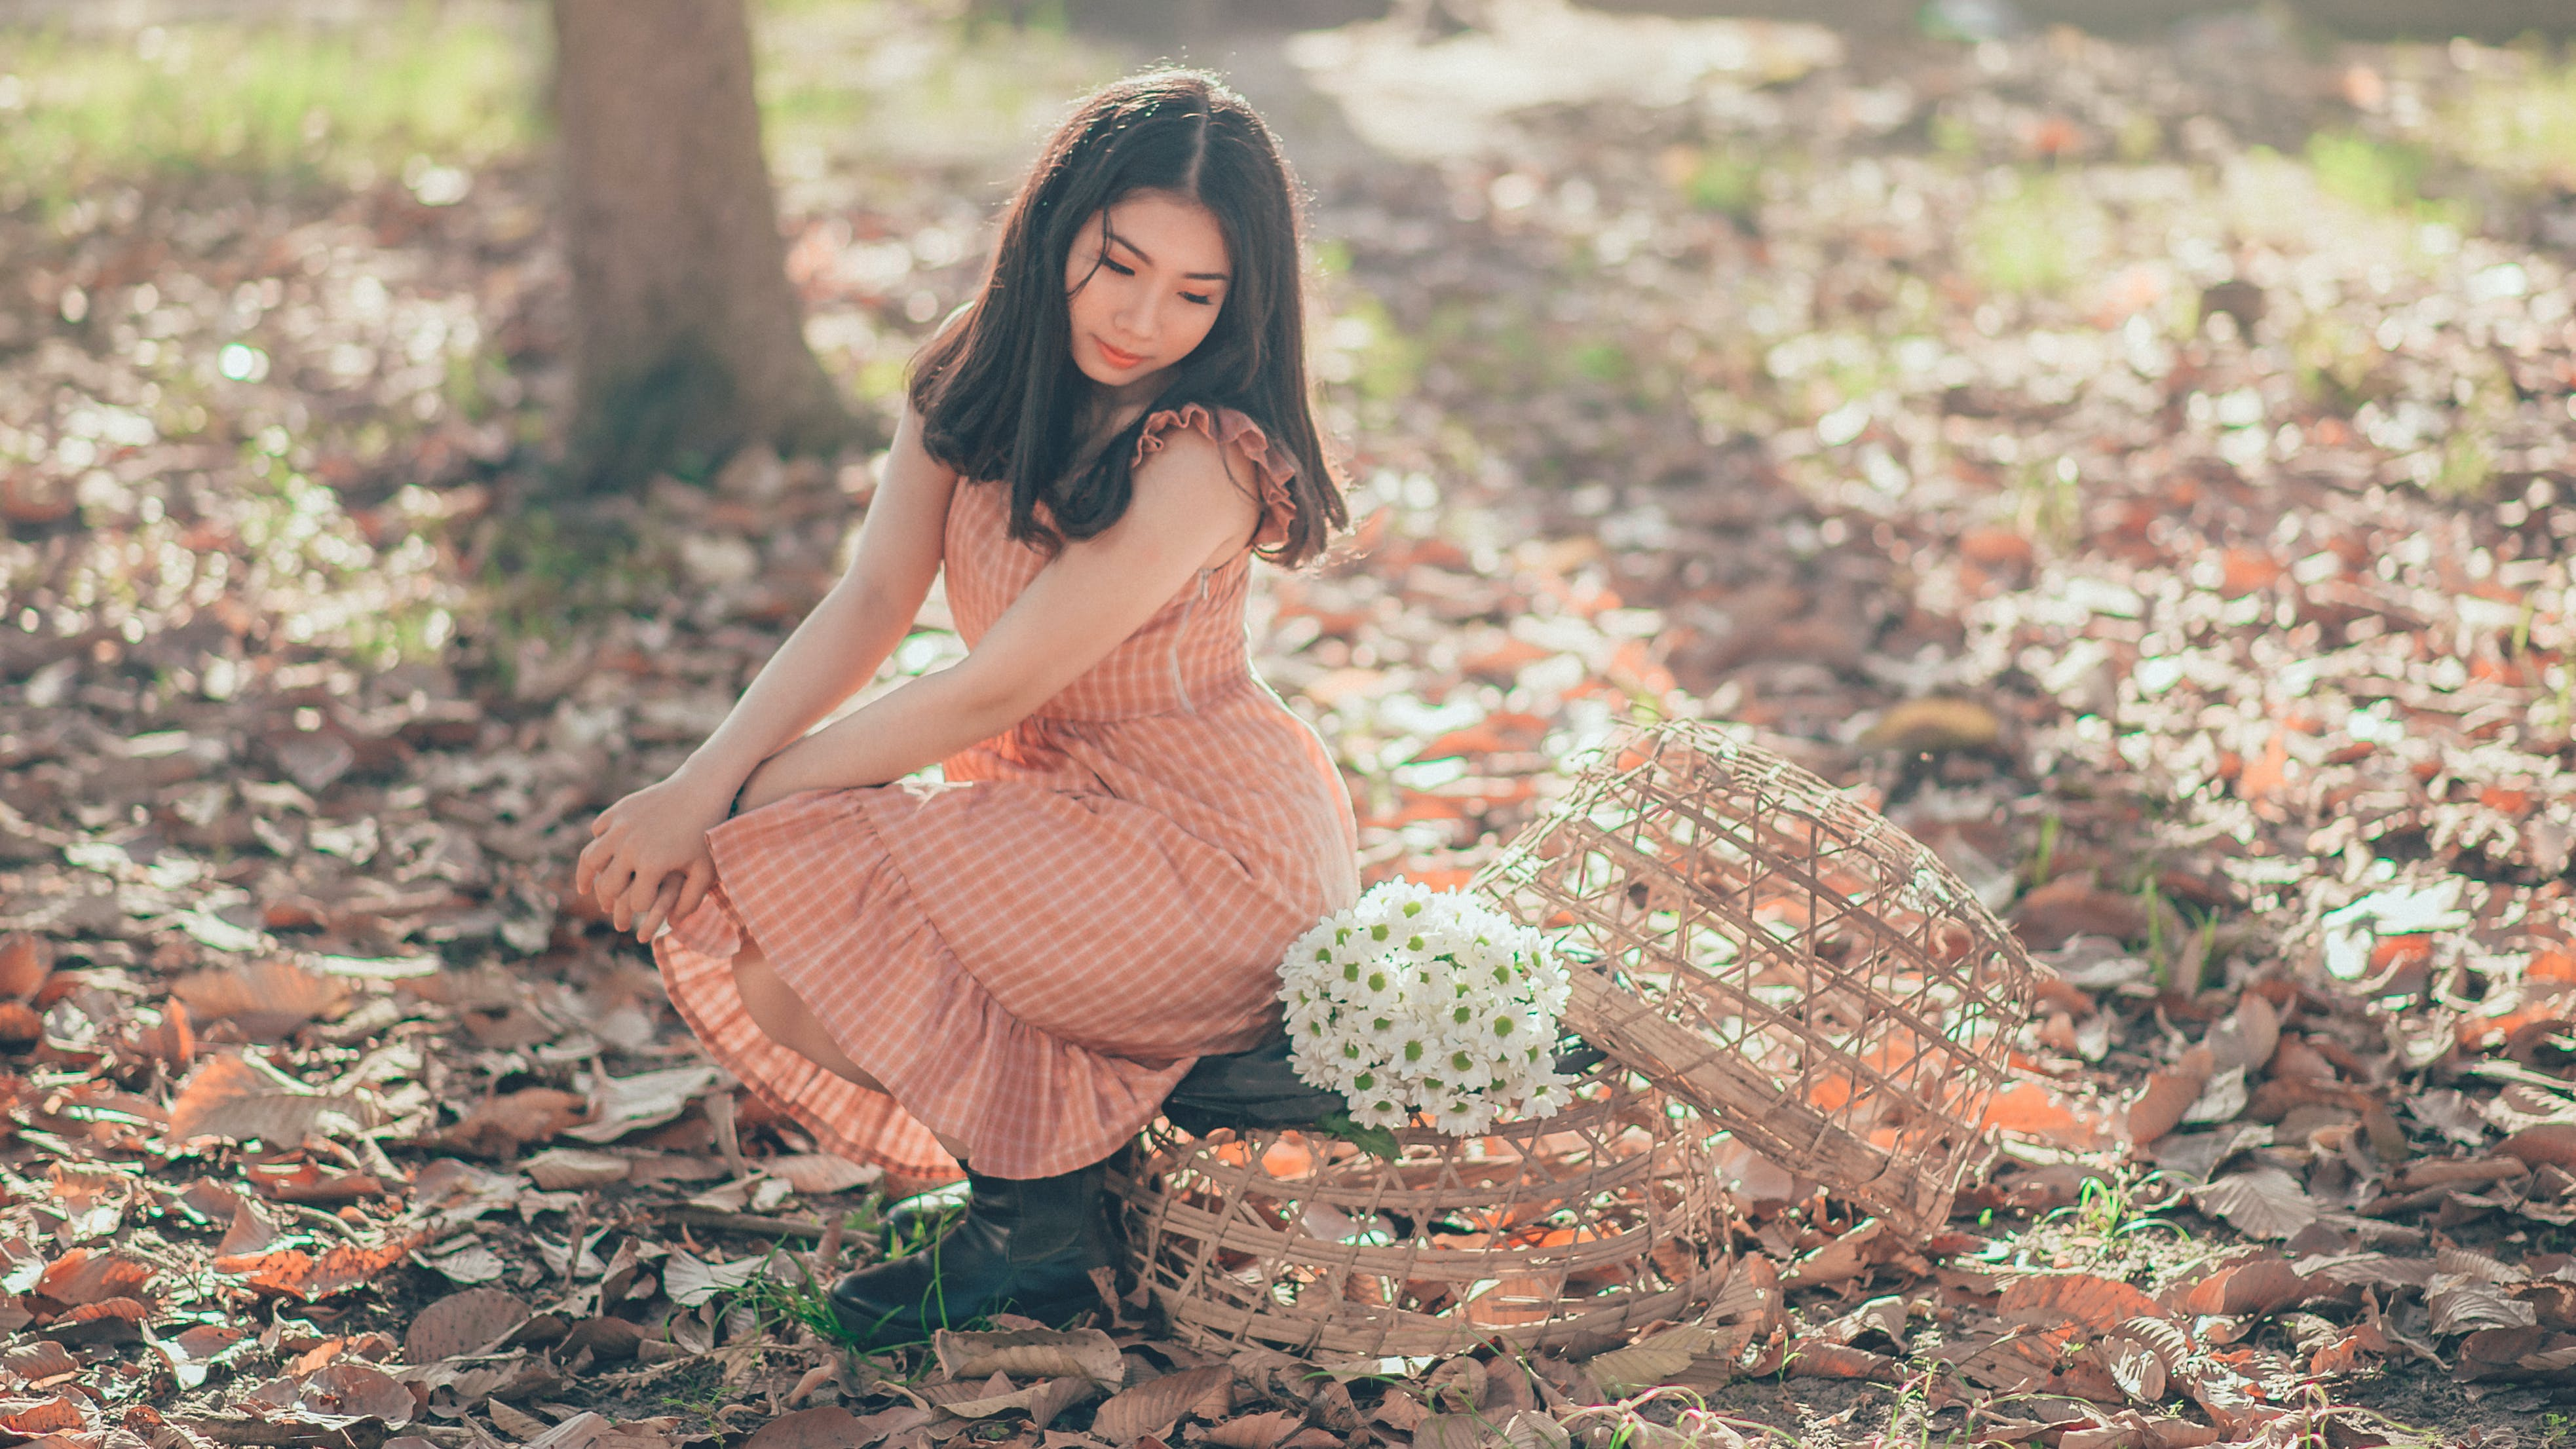 Woman Sitting Beside a Flower Bouquet